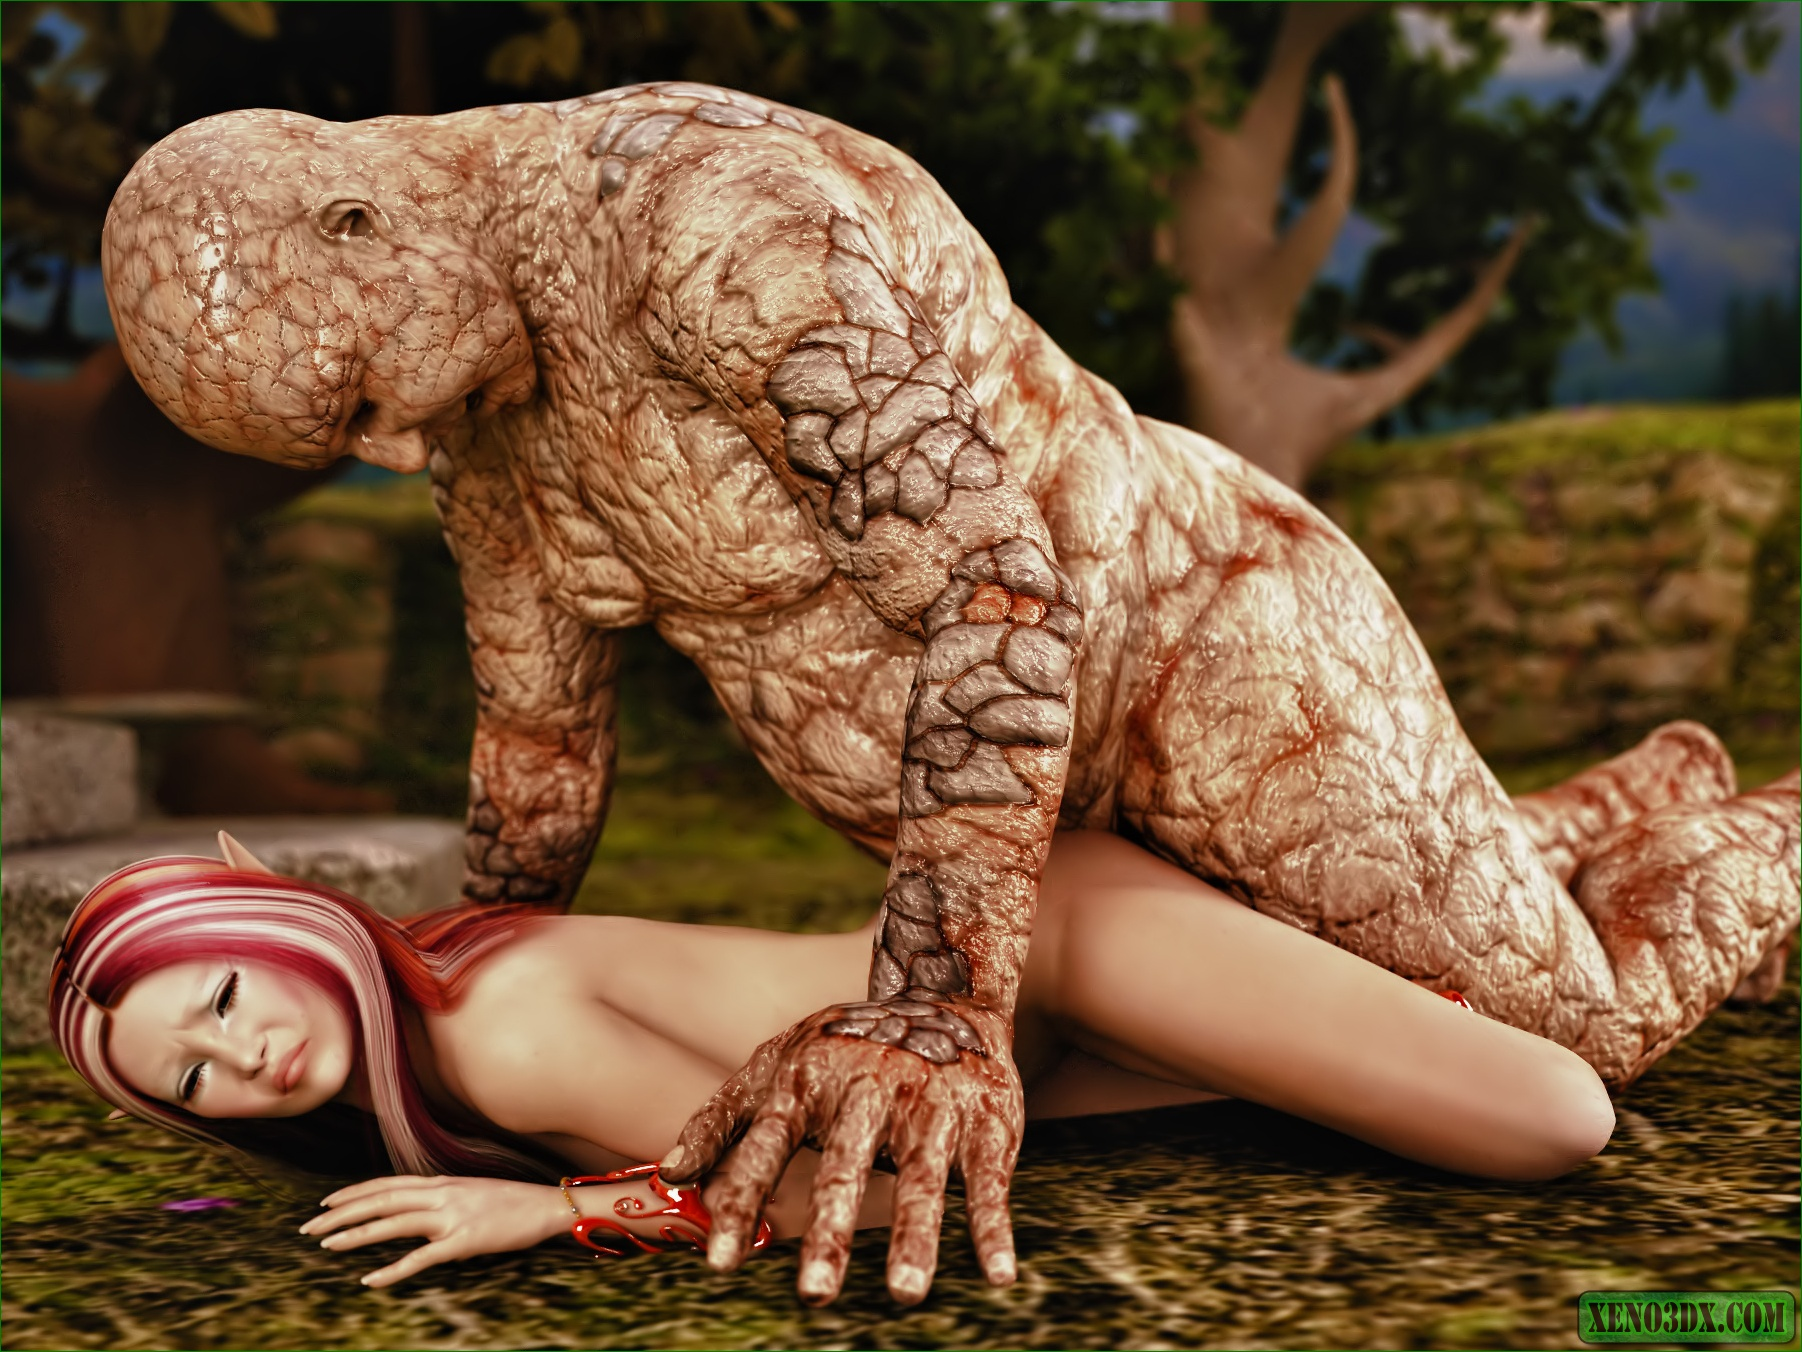 Monster vs girl 3d henti pics pornos gallery